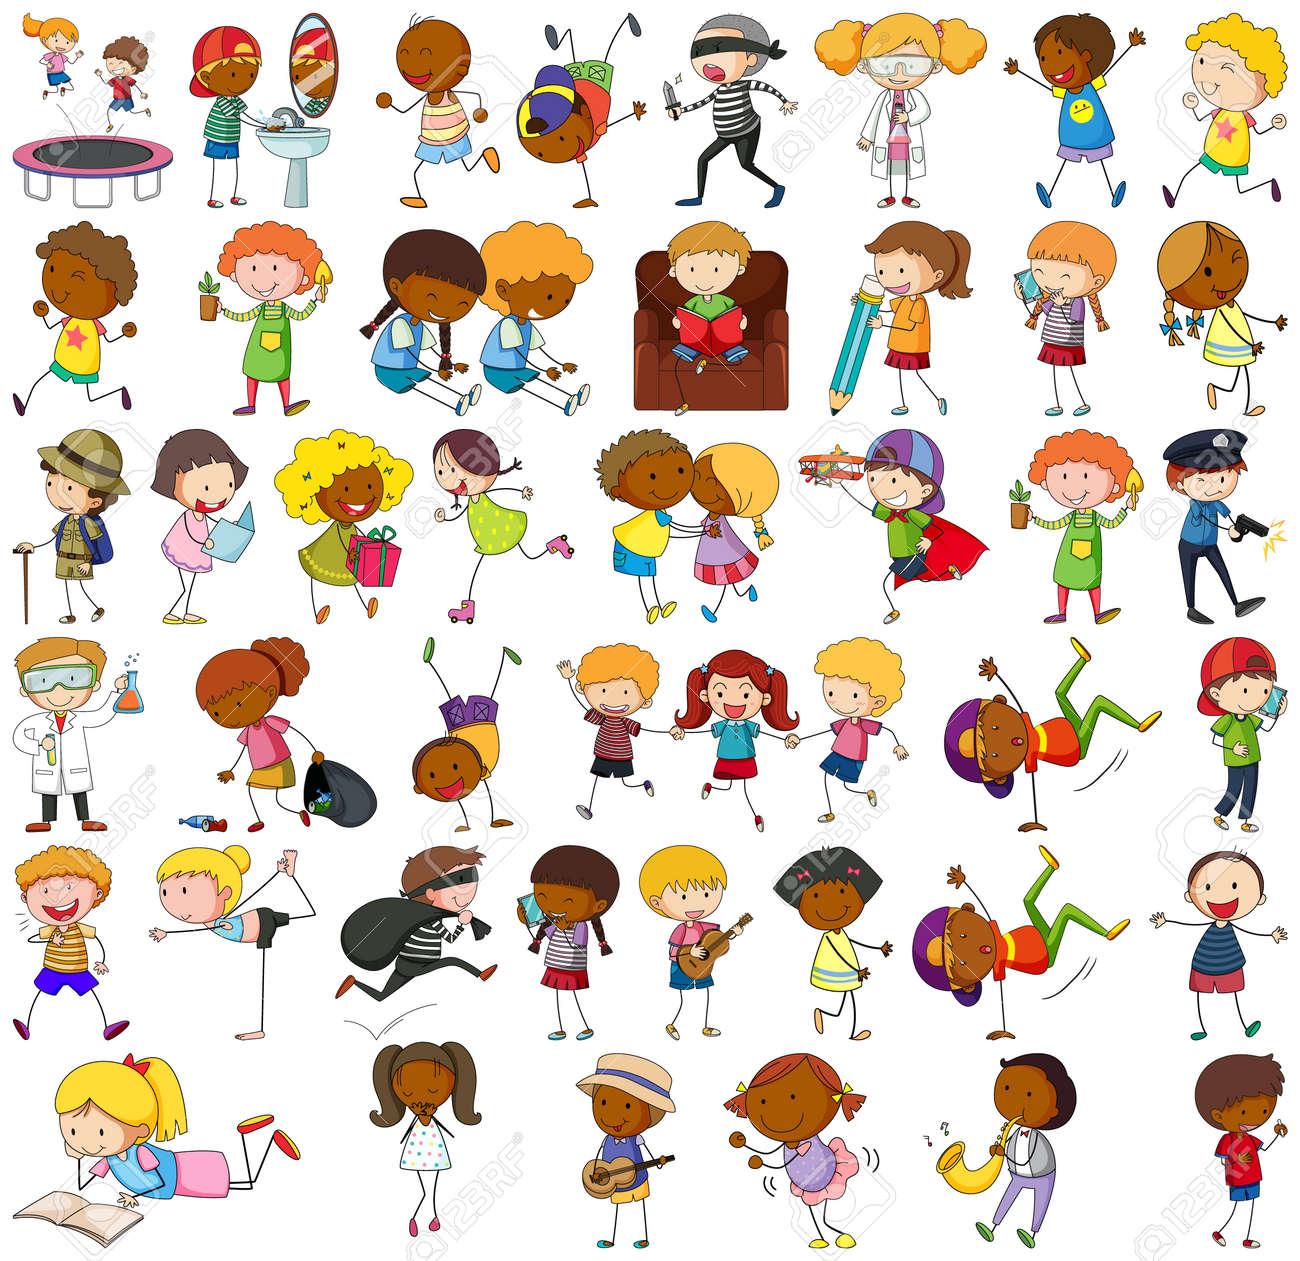 Set of different doodle kids cartoon character illustration - 166488529